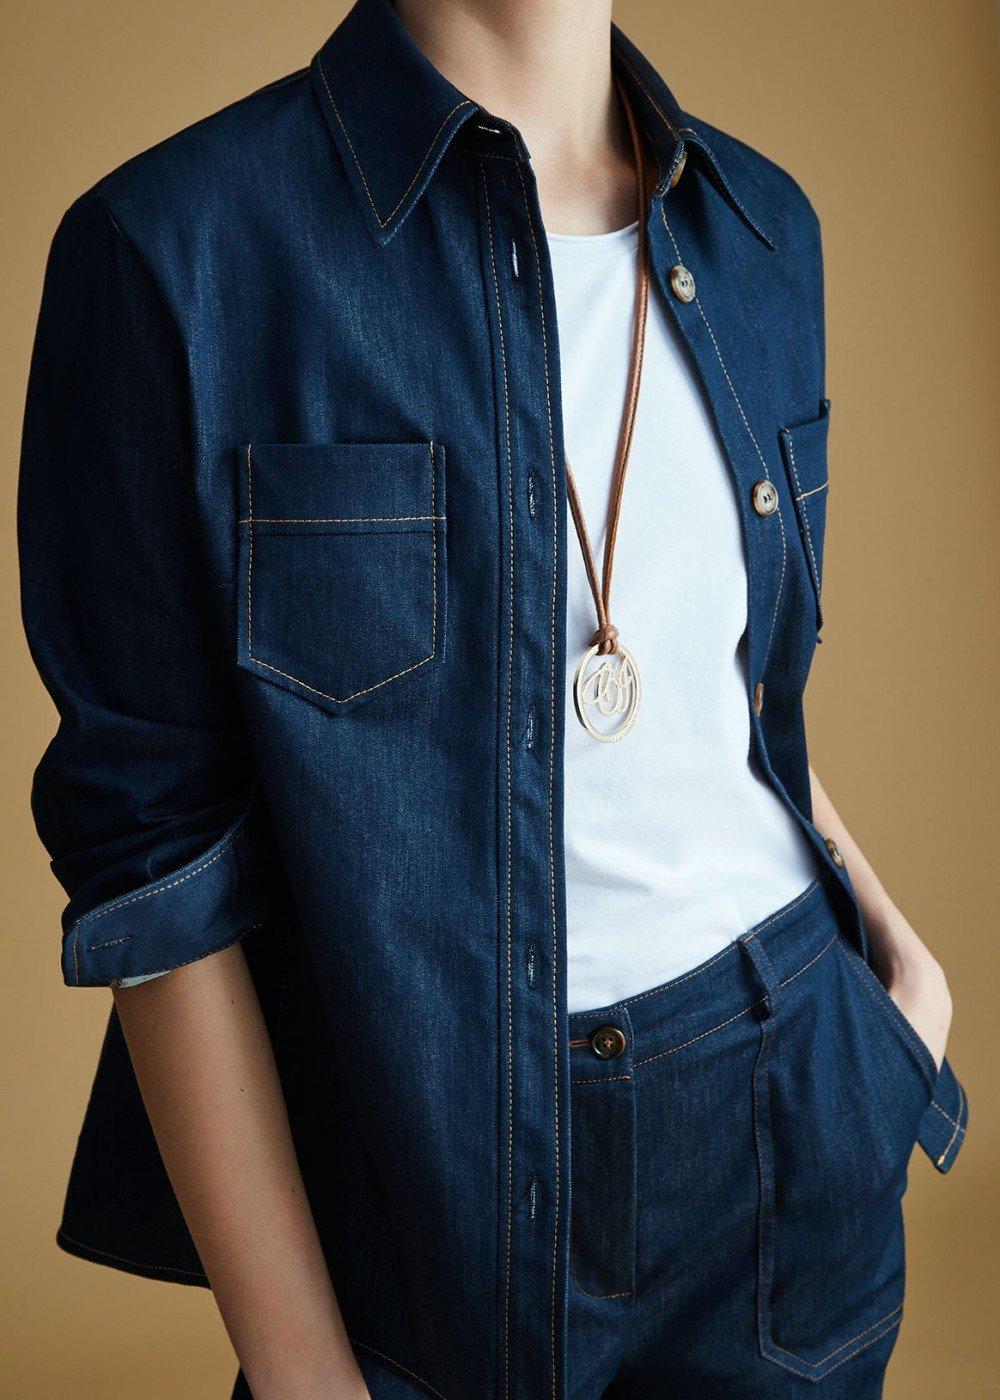 Kate shirt with contrasting stitching - Dark Denim - Woman